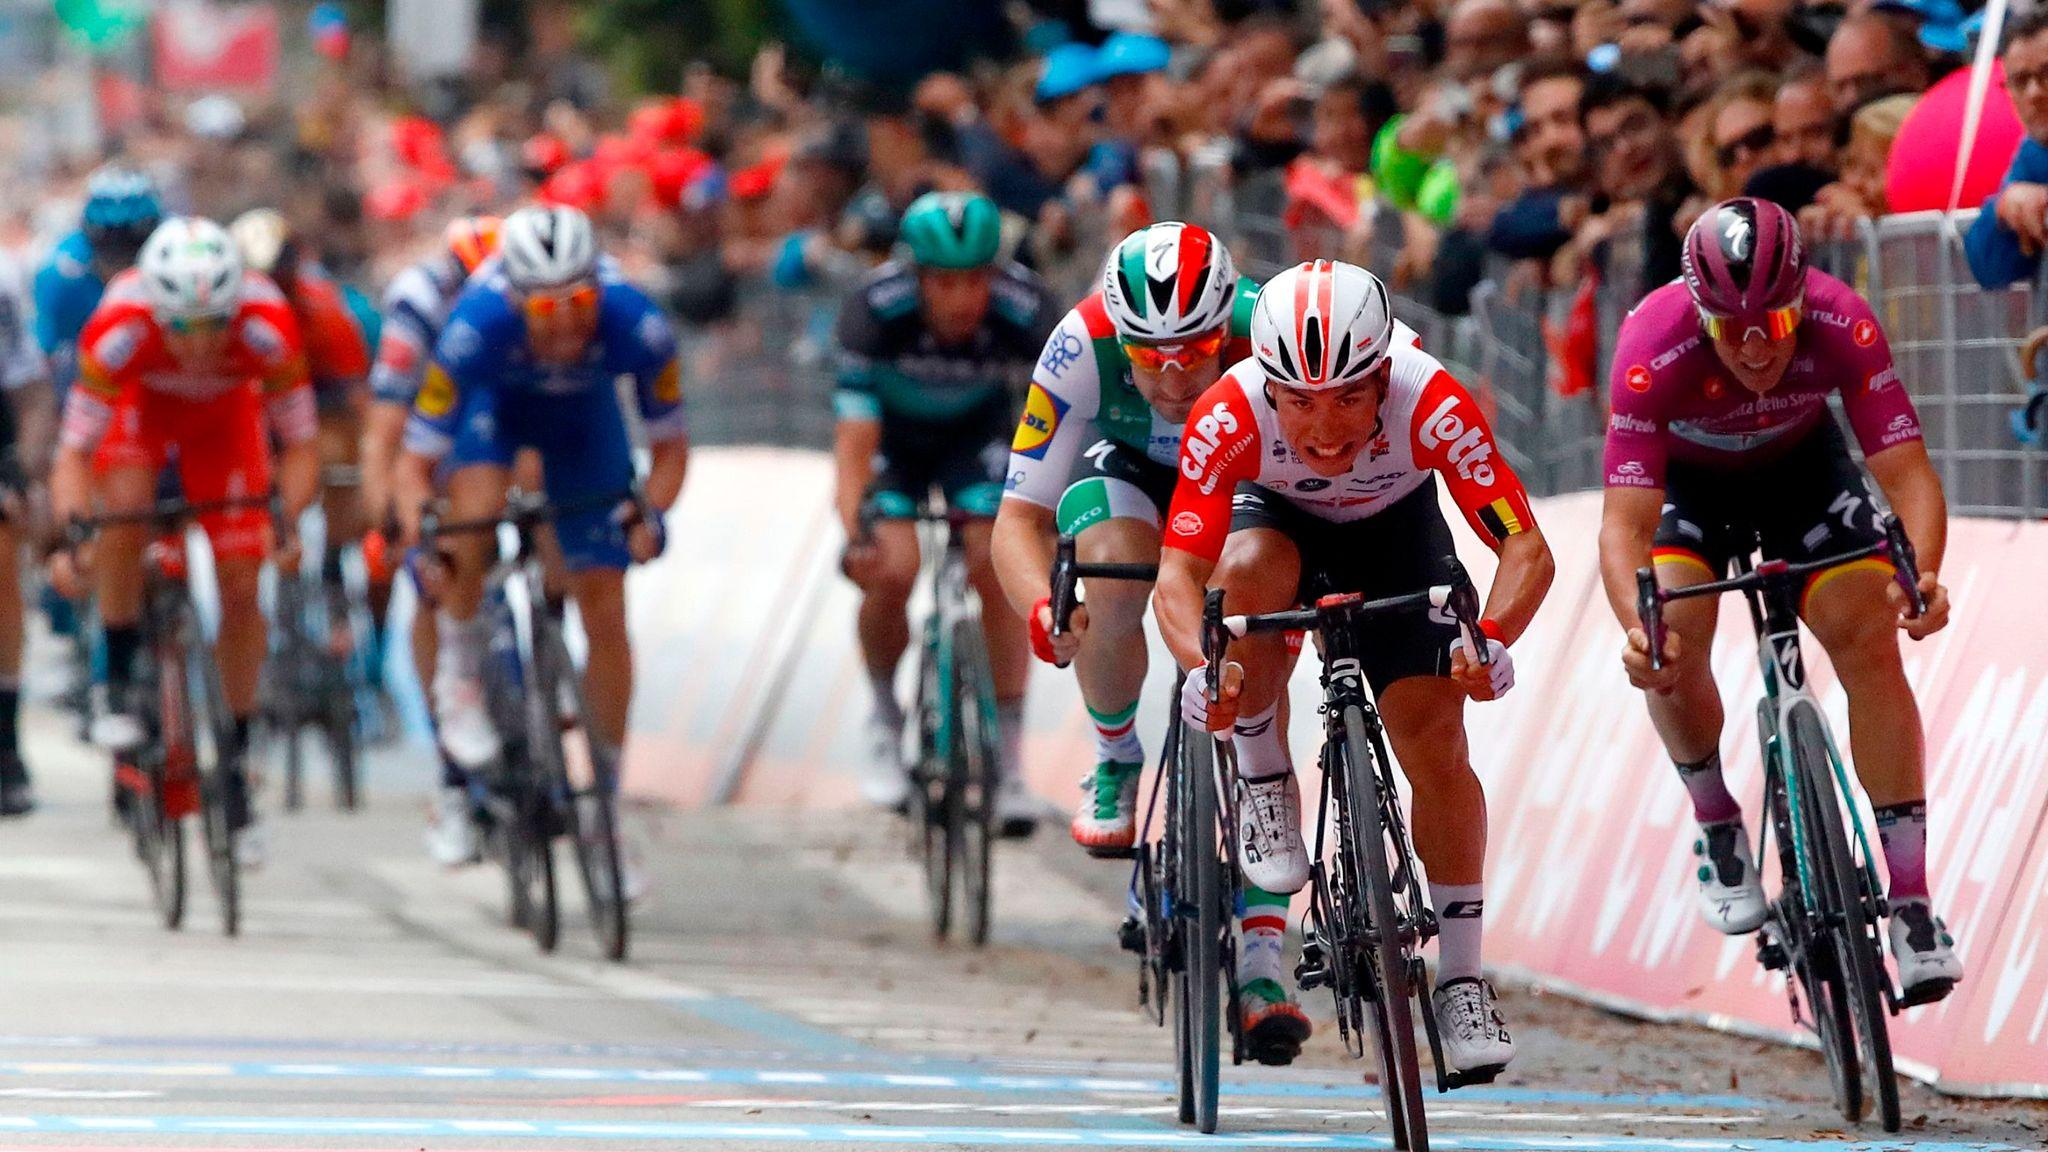 Caleb Ewan wins eighth stage on the Giro d'Italia